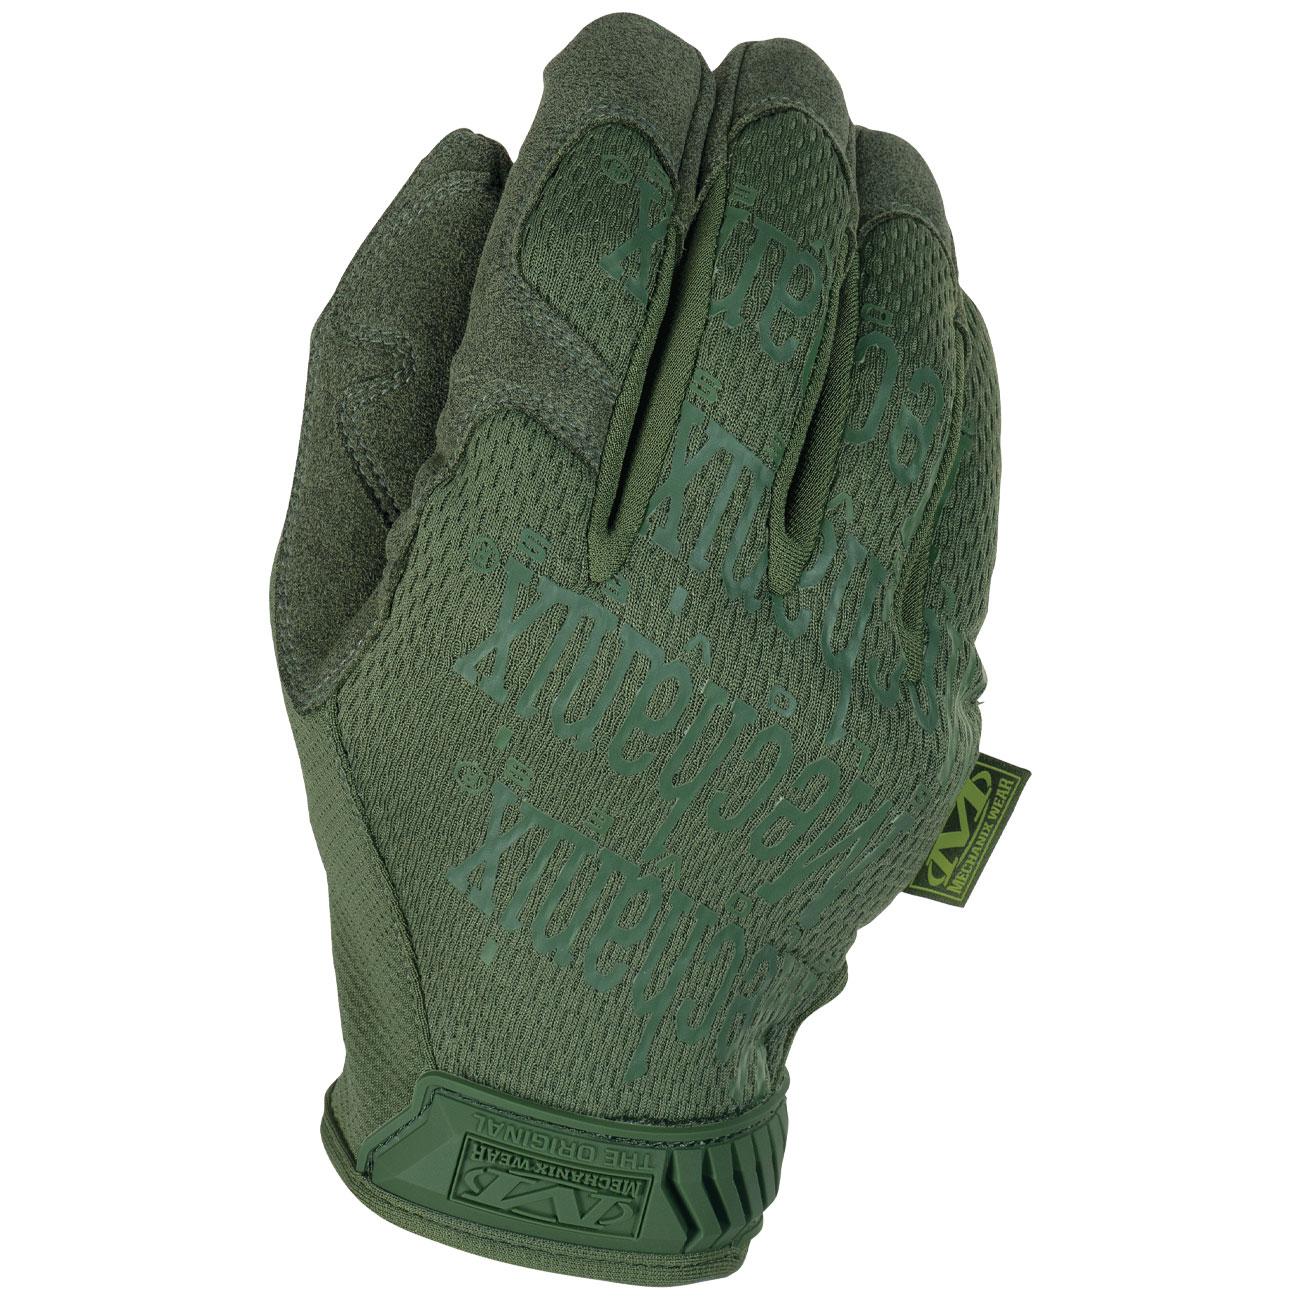 Mechanix Original Handschuhe